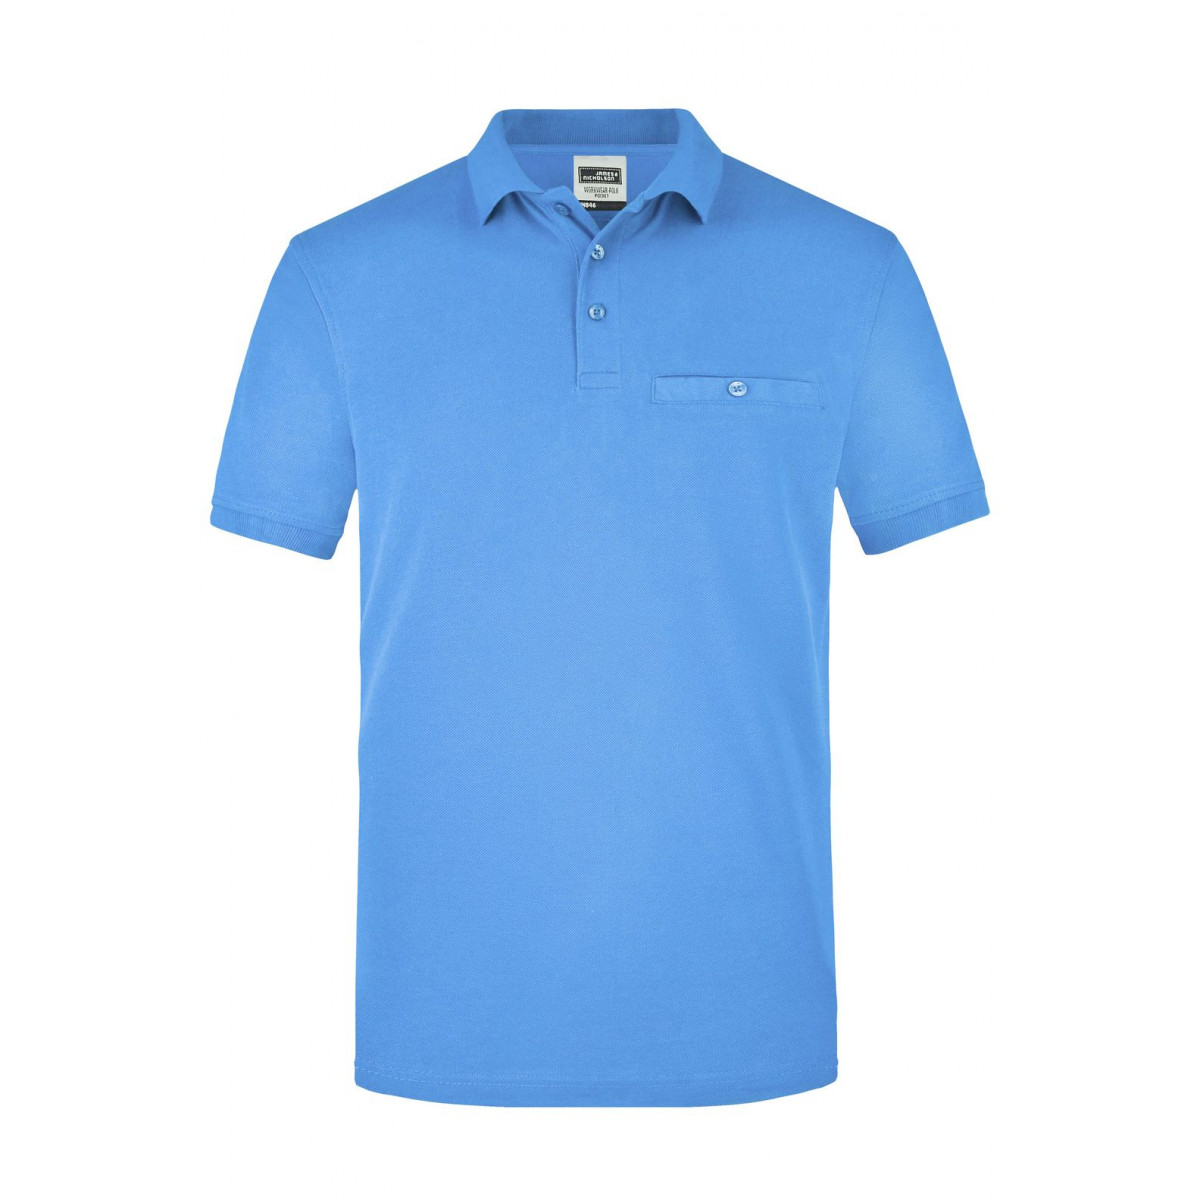 Рубашка поло мужская JN846 Men´s Workwear Polo Pocket - Аква